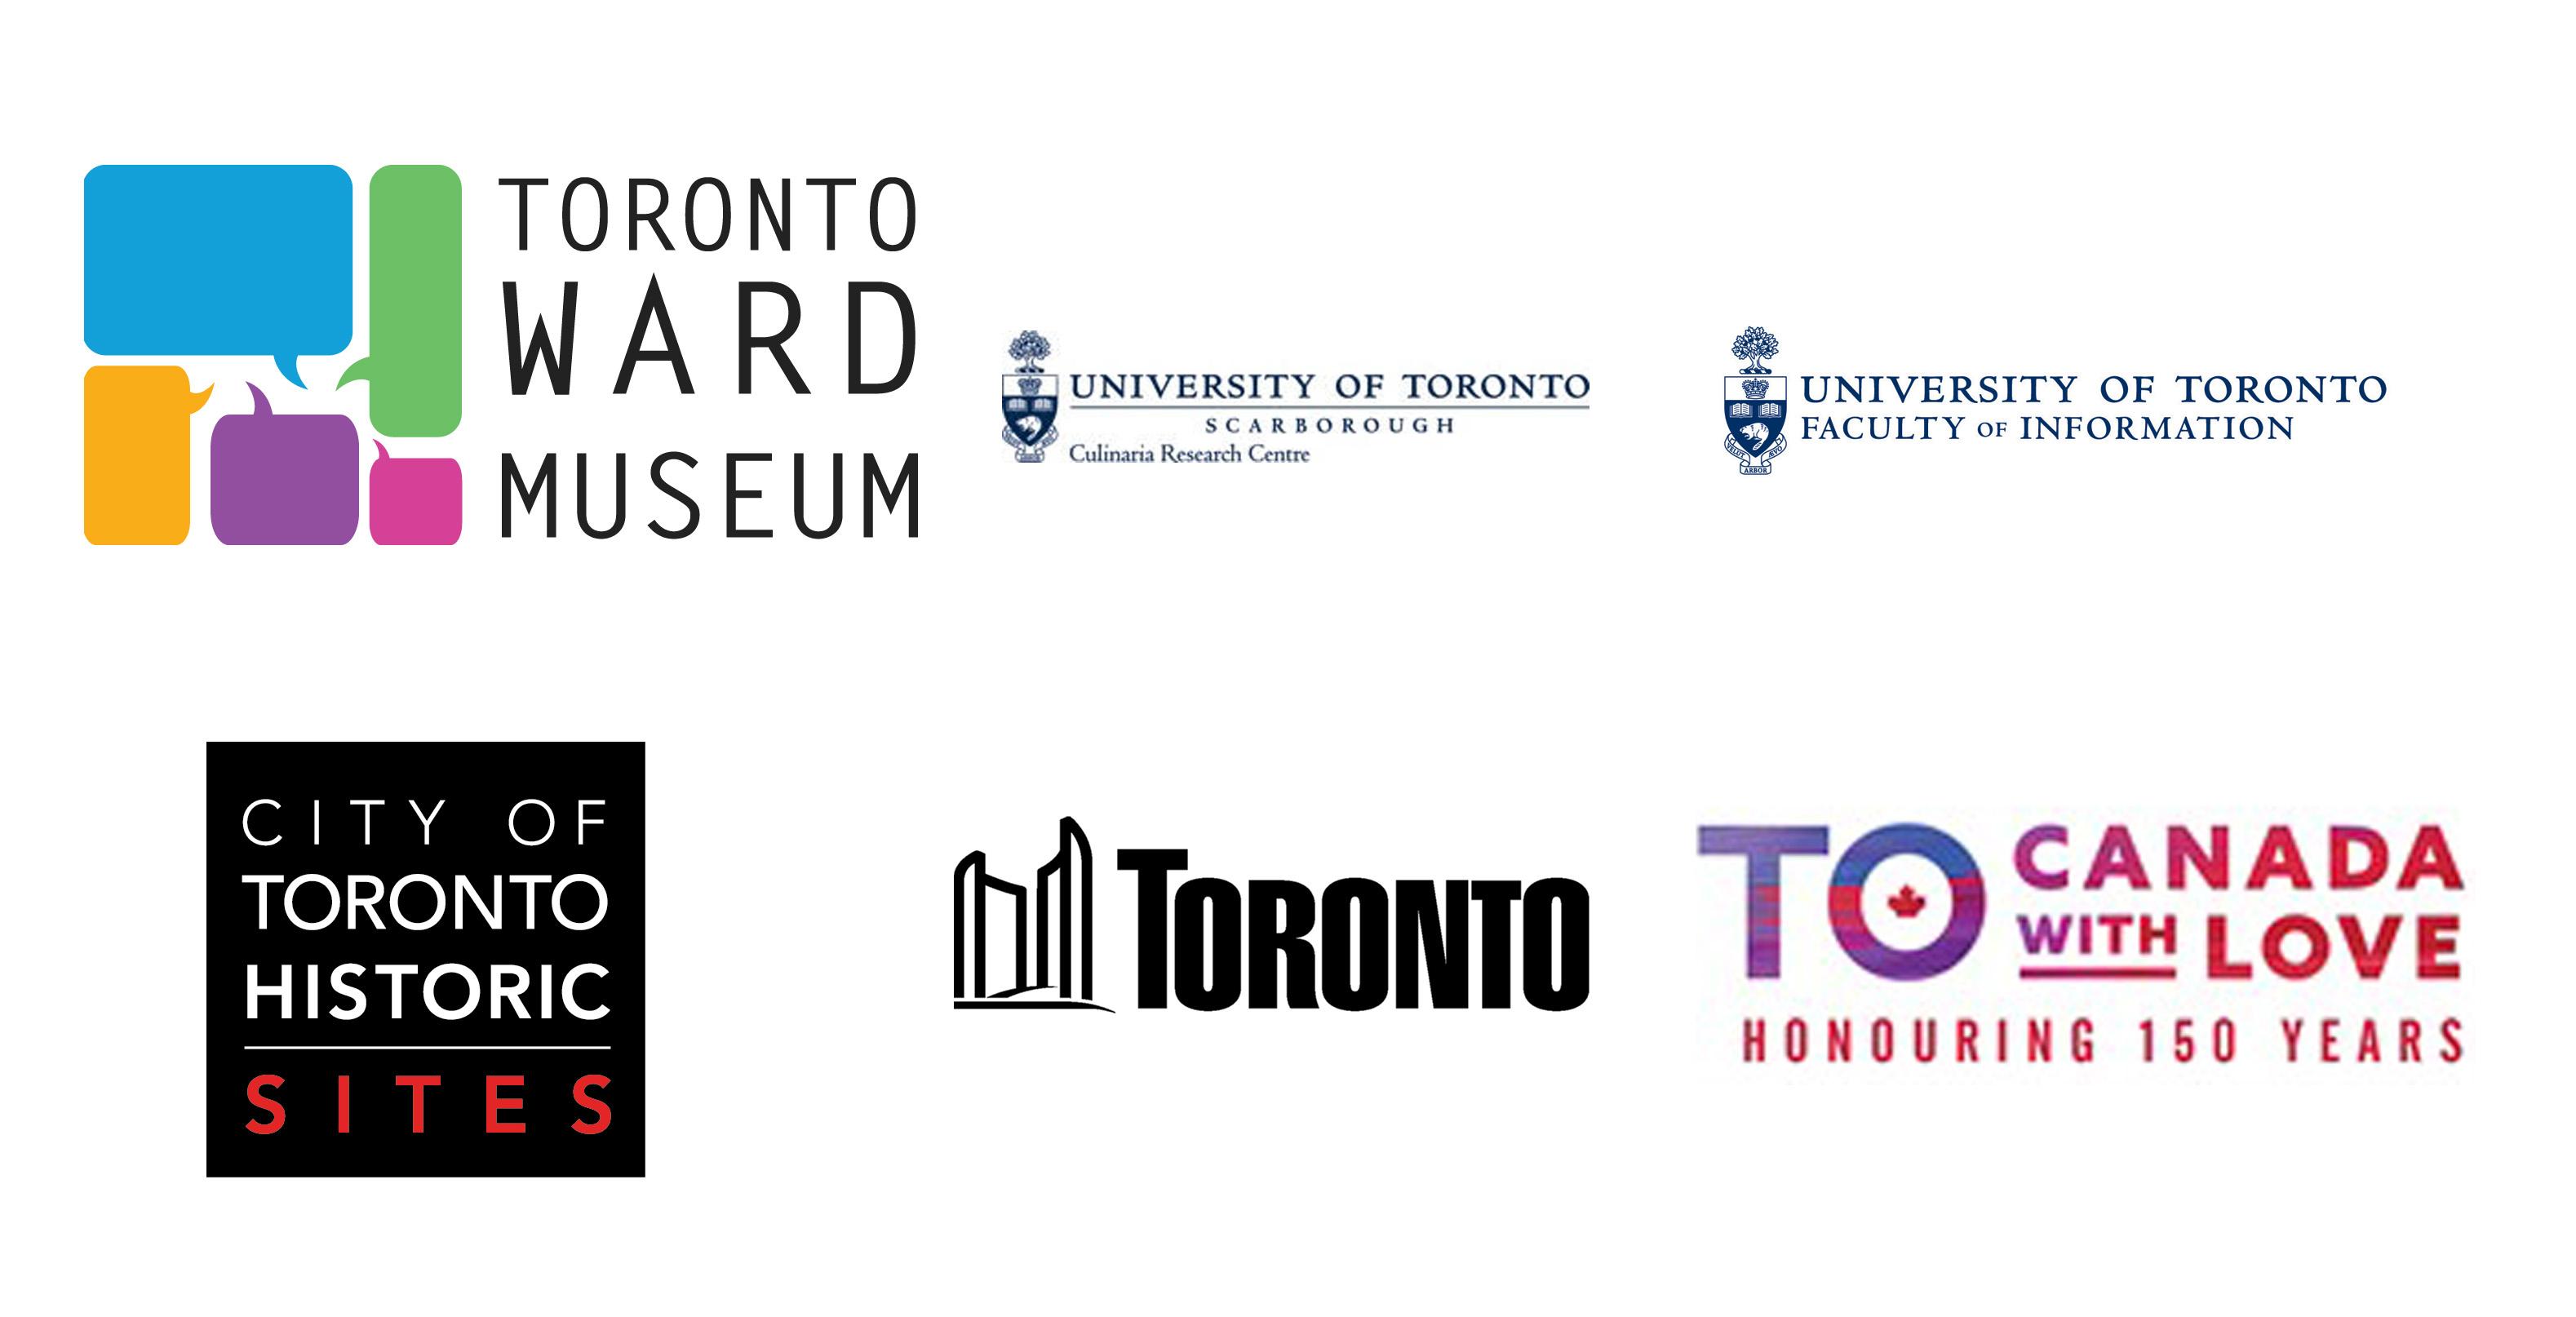 Dishing Up Toronto Ward Museum and City of Toronto partner logo combo